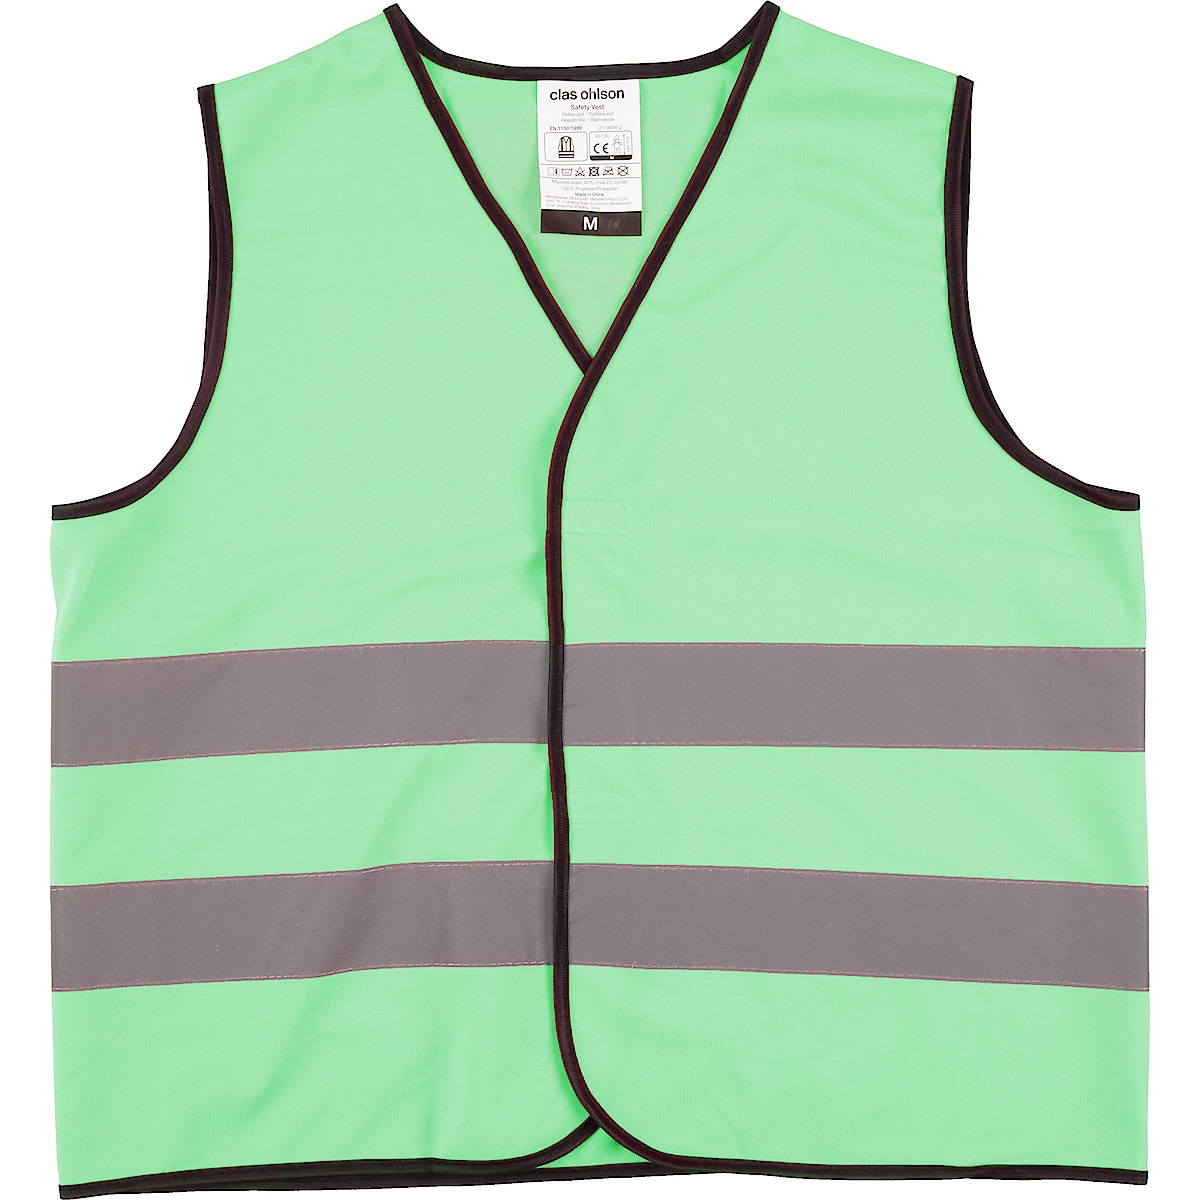 Reflexväst grön, Clas Ohlson